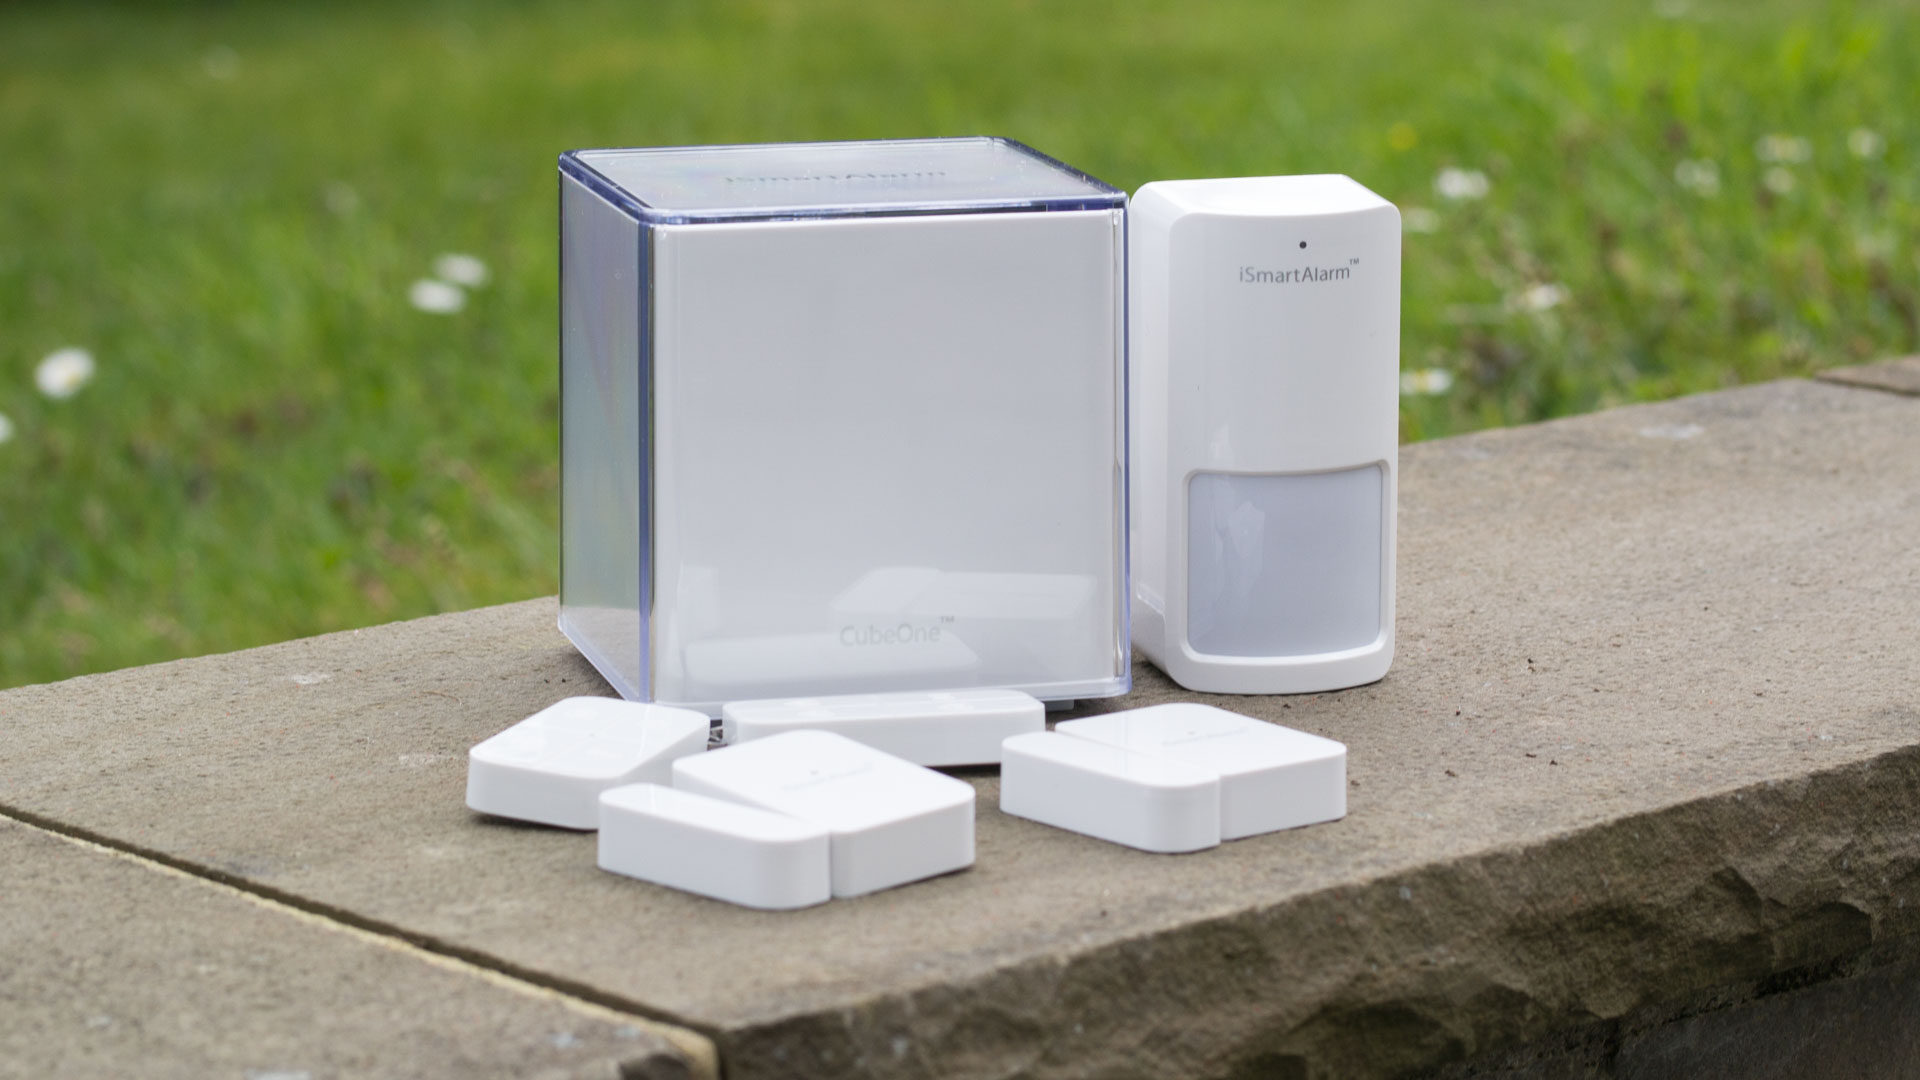 smart alarmanlage im test das ismartalarm preferred package techtest. Black Bedroom Furniture Sets. Home Design Ideas